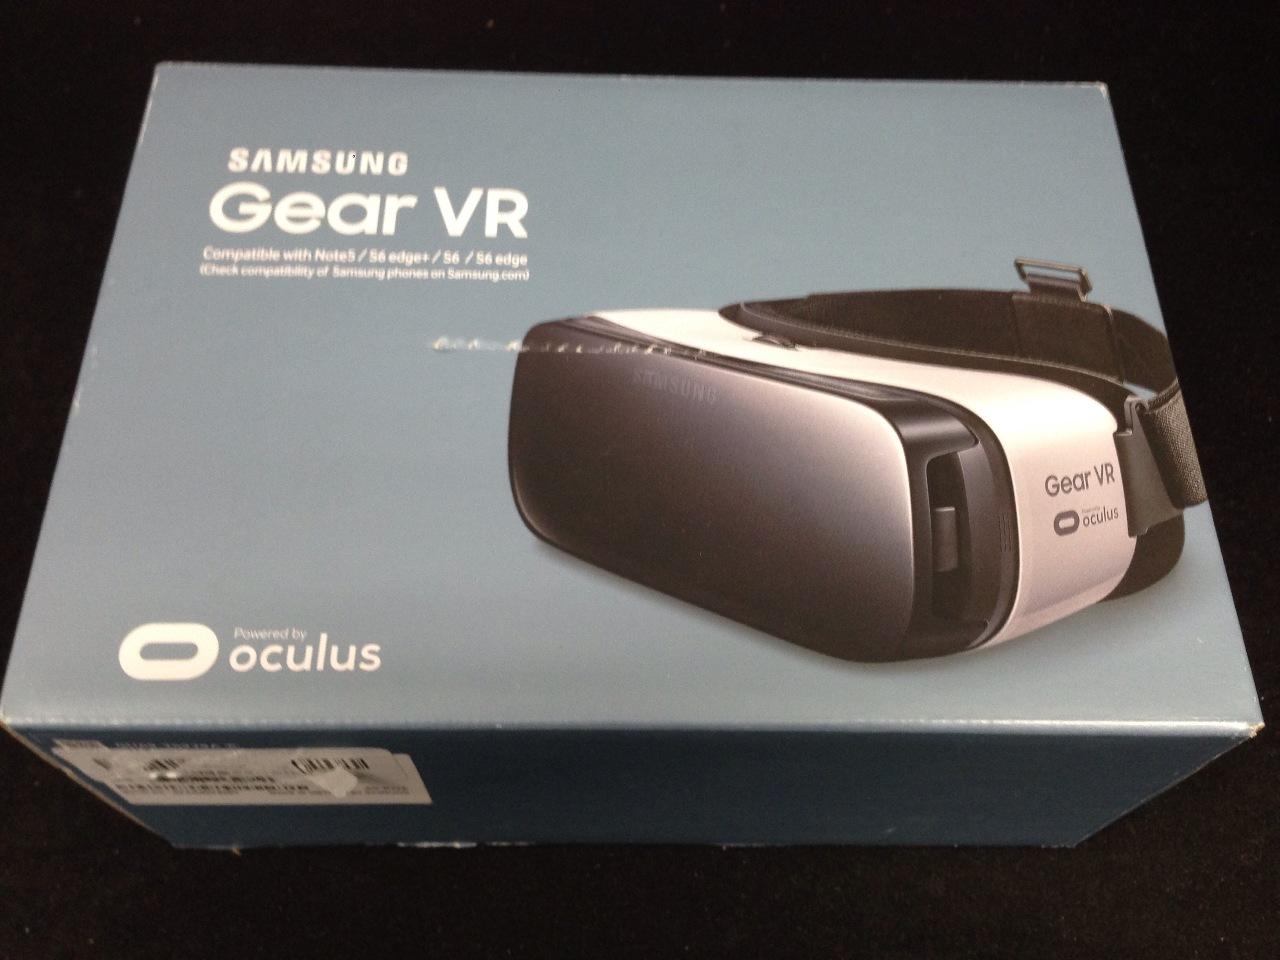 Samsung Gear VR - Virtual Reality Headset - Note 5 / S6 edge  / S6 / S6 edge